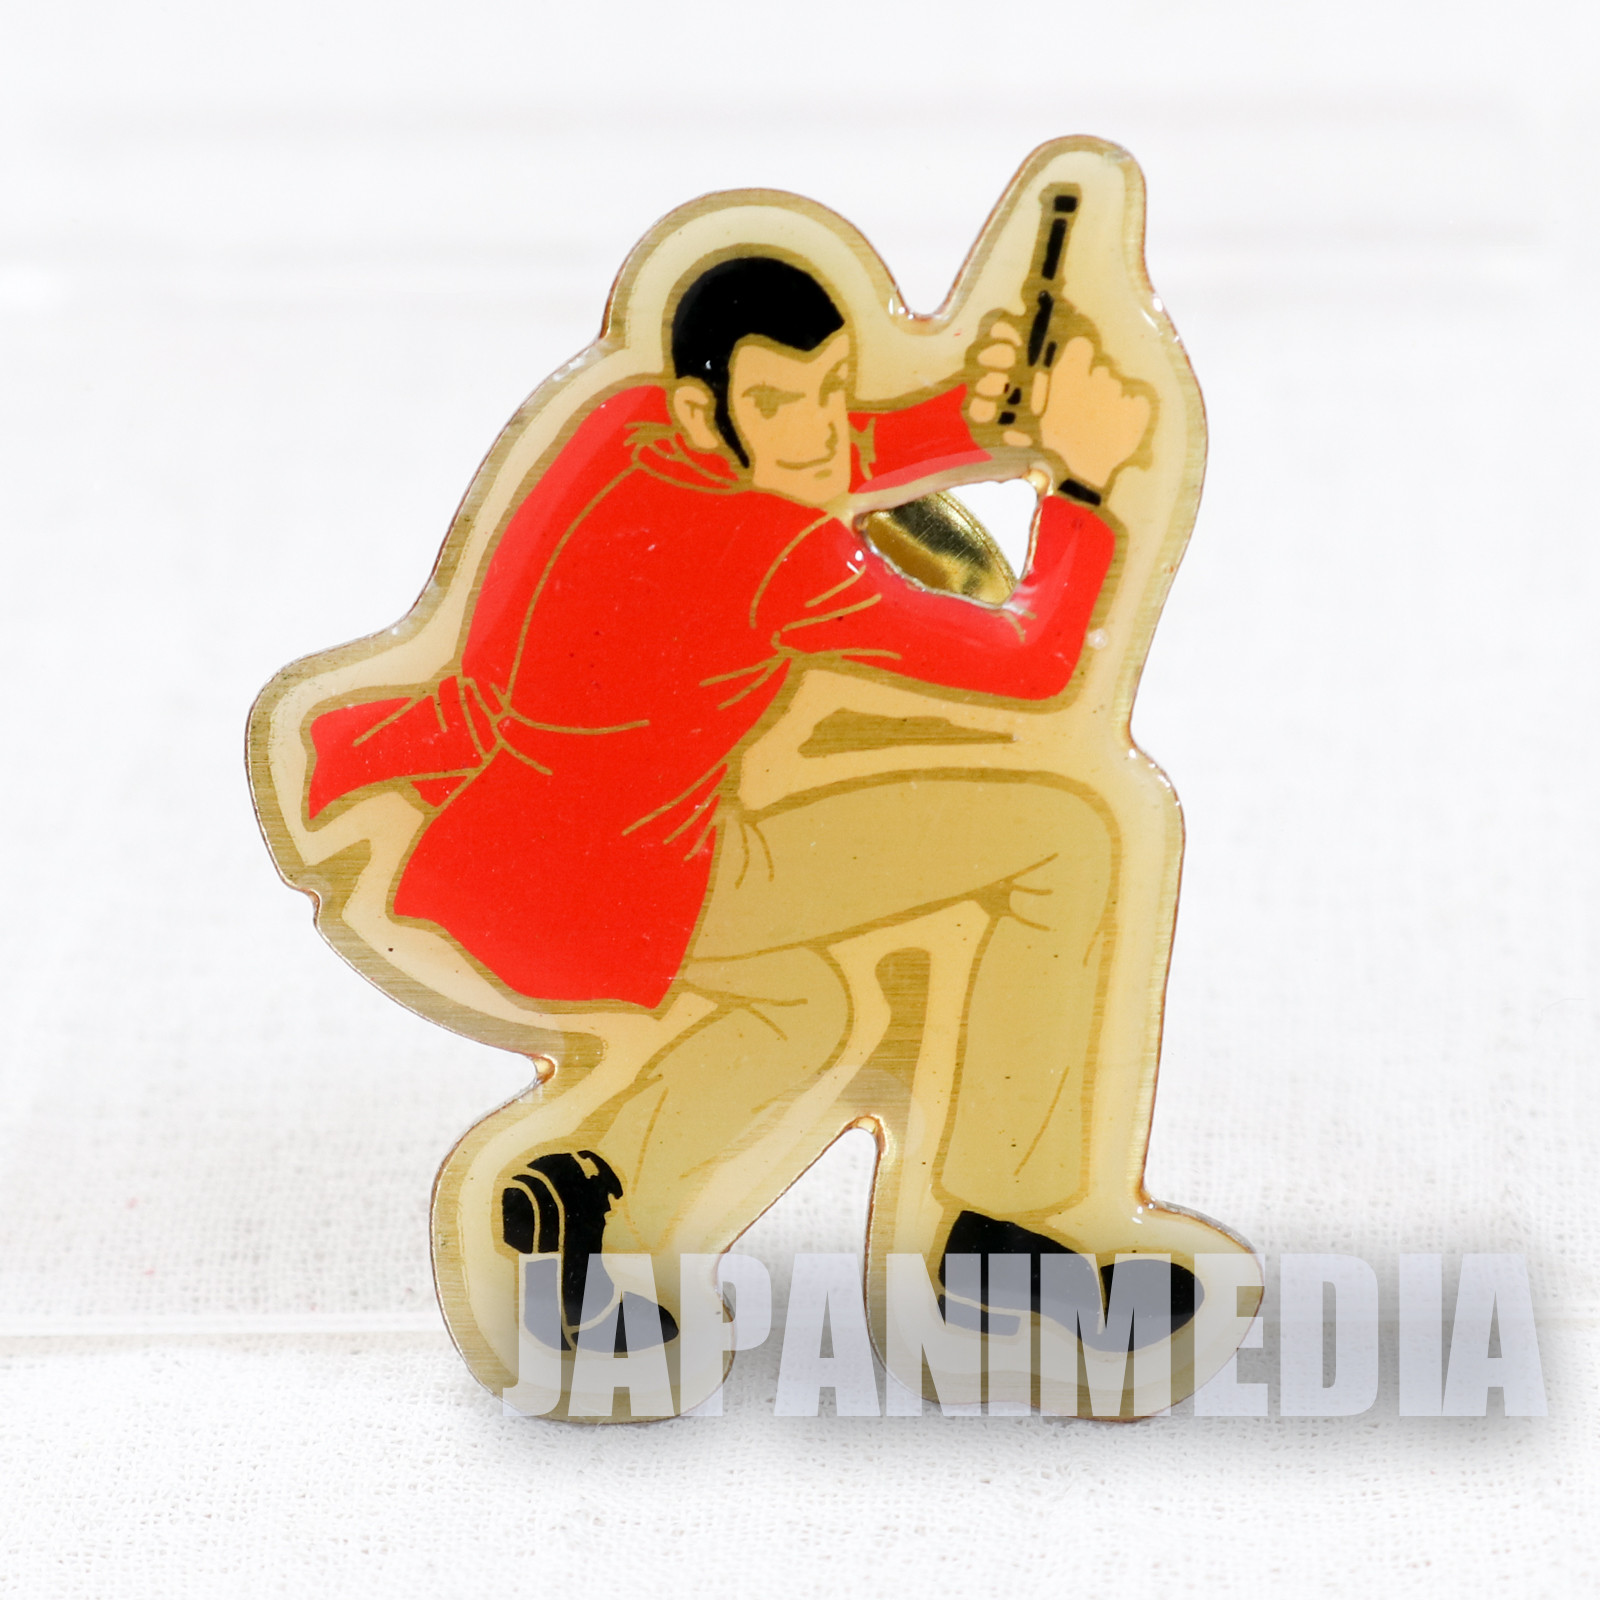 Lupin the Third (3rd) Metal Pins #1 JAPAN ANIME